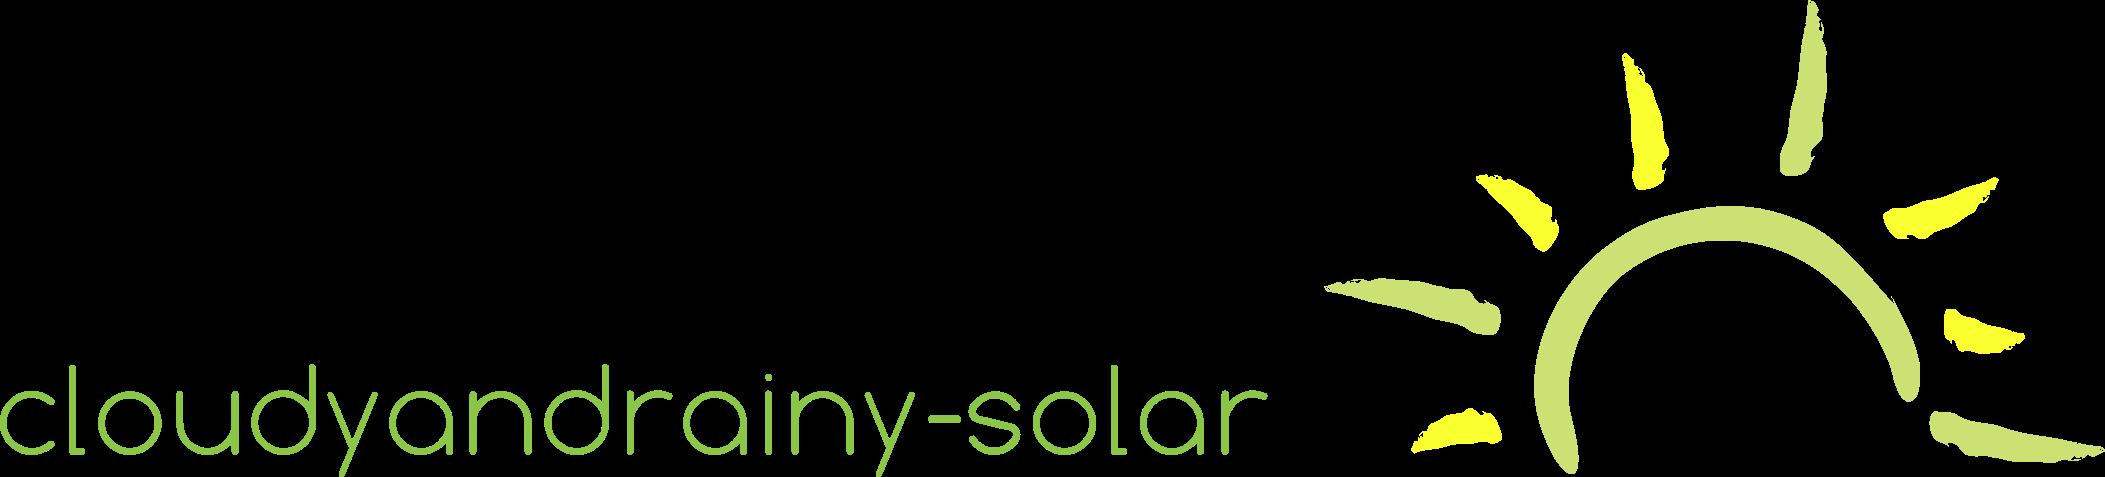 cloudyandrainy-solar.de